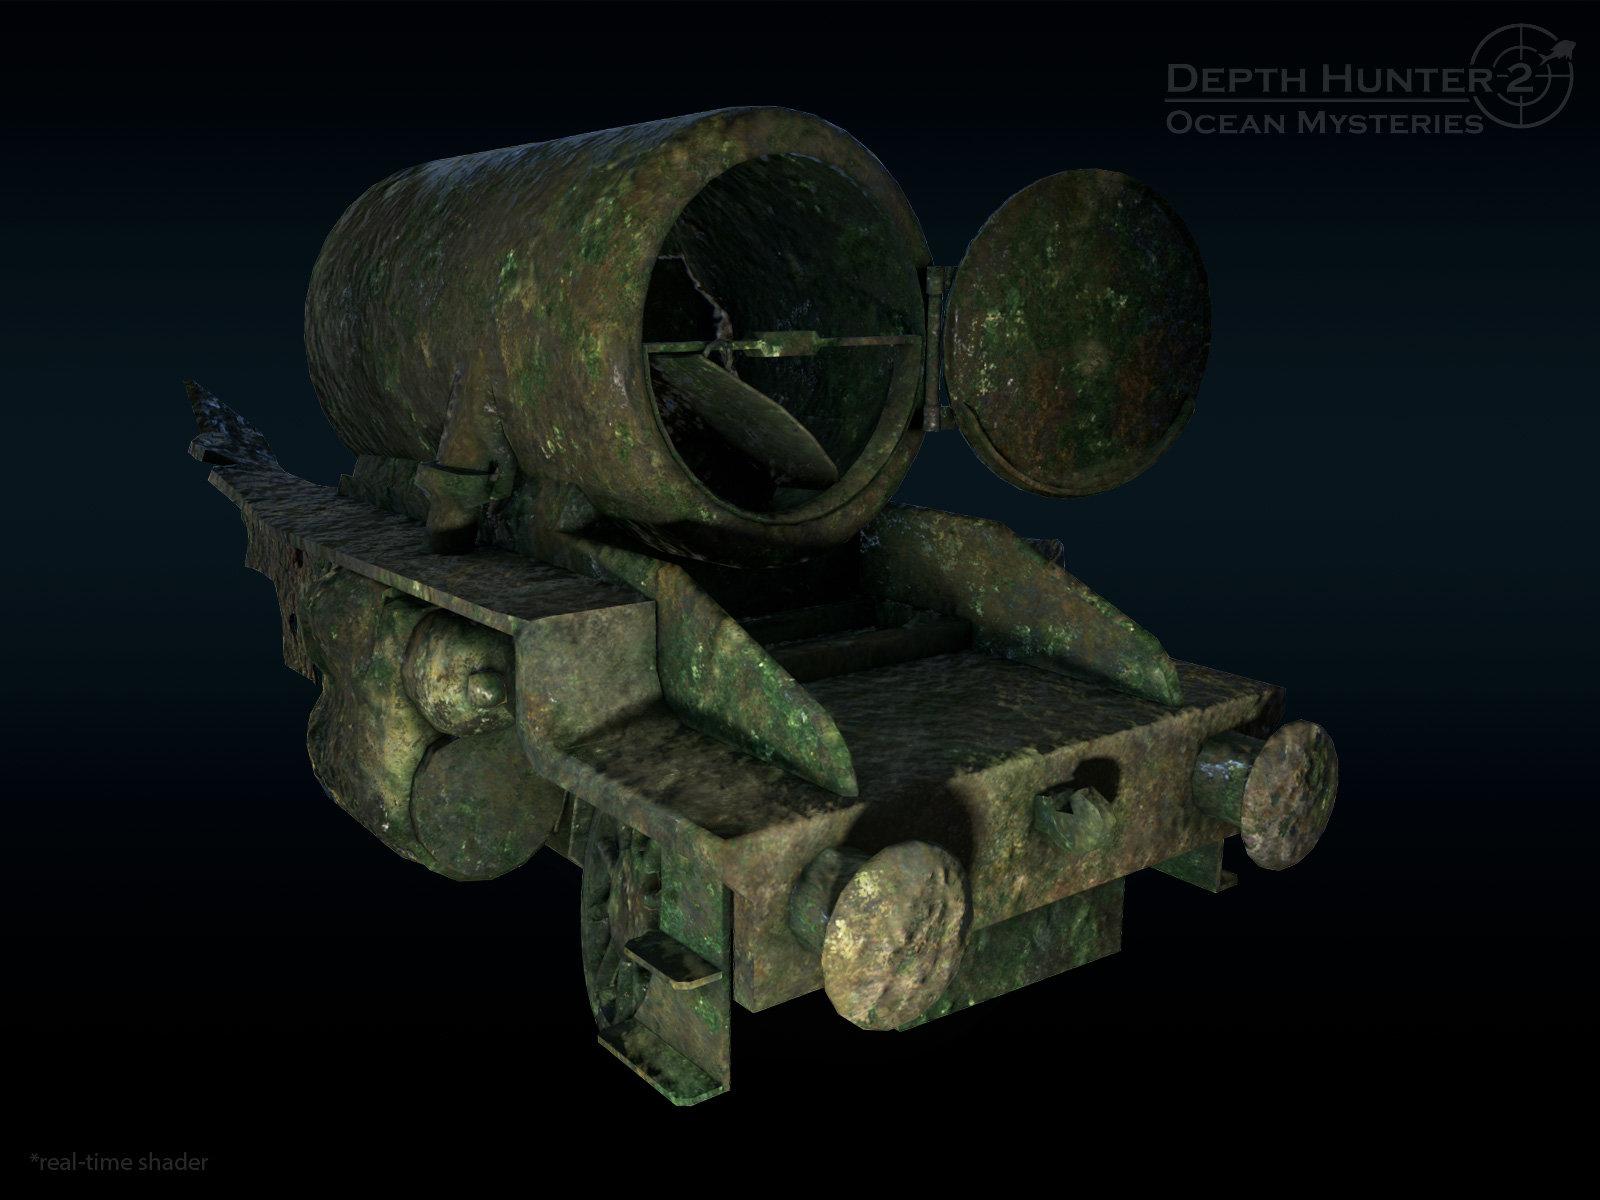 Demitry nemirovskiy carriage2 1